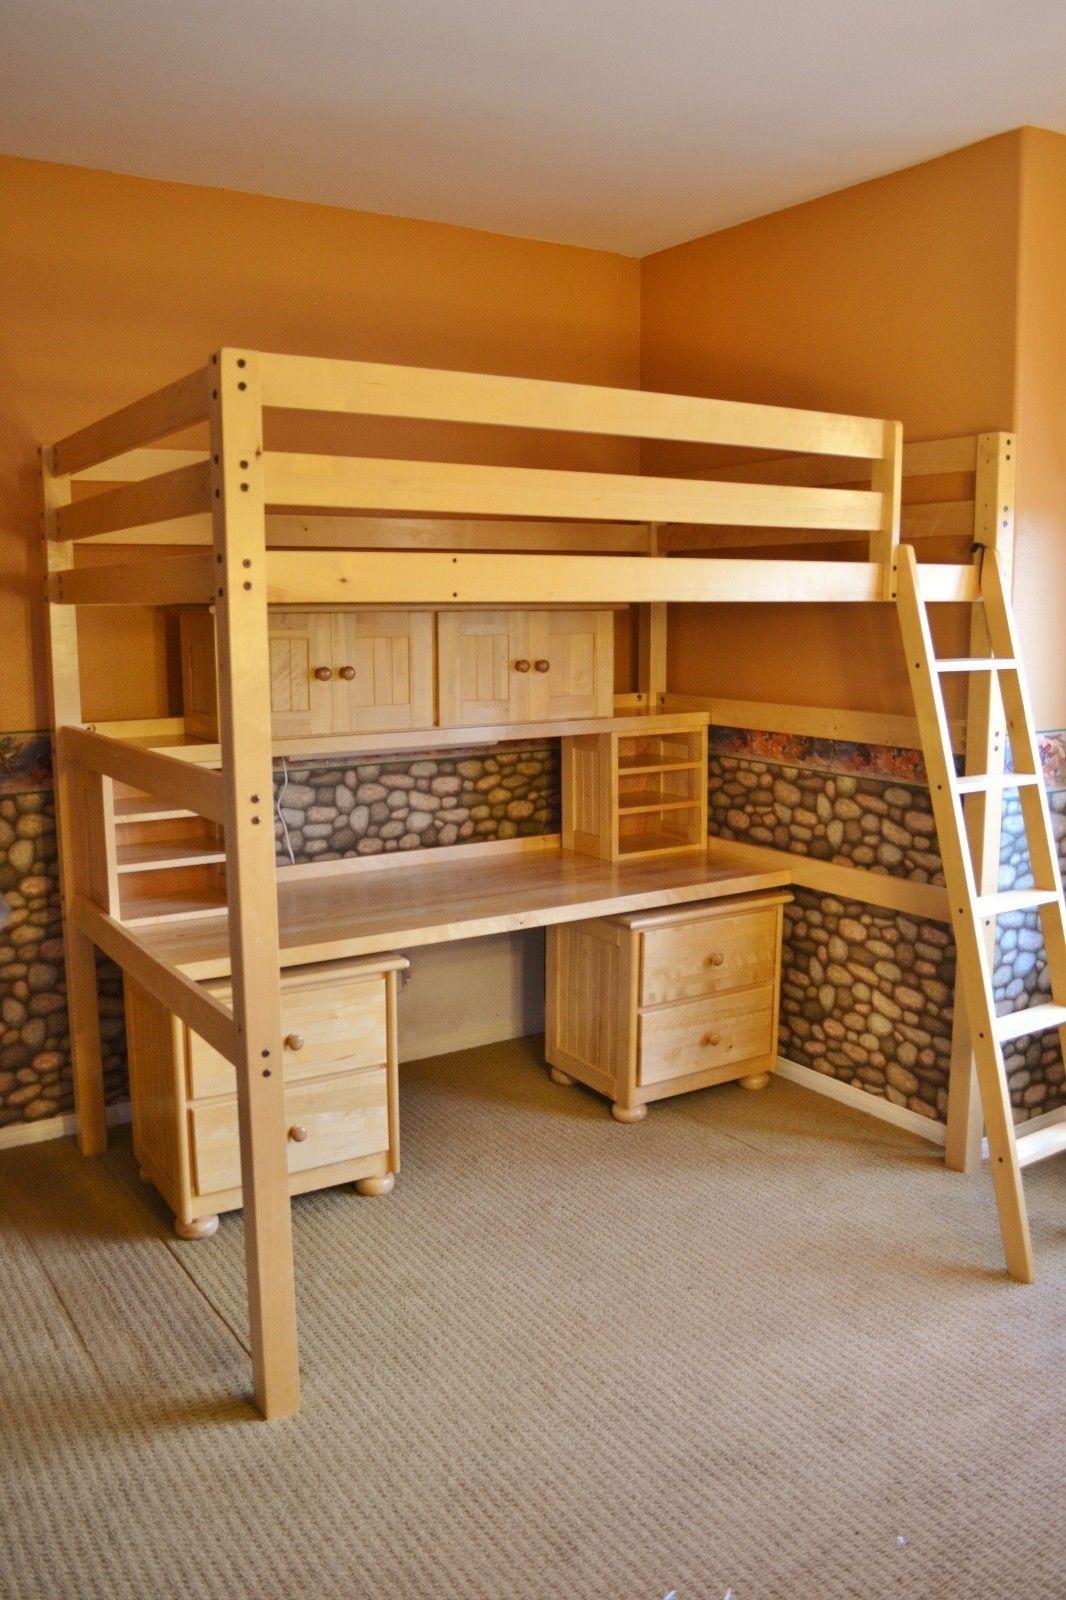 Javin loft bed with desk  CHILDRENuS STUDENT FULLSIZED Loft Bed and Desk System  wood stuff